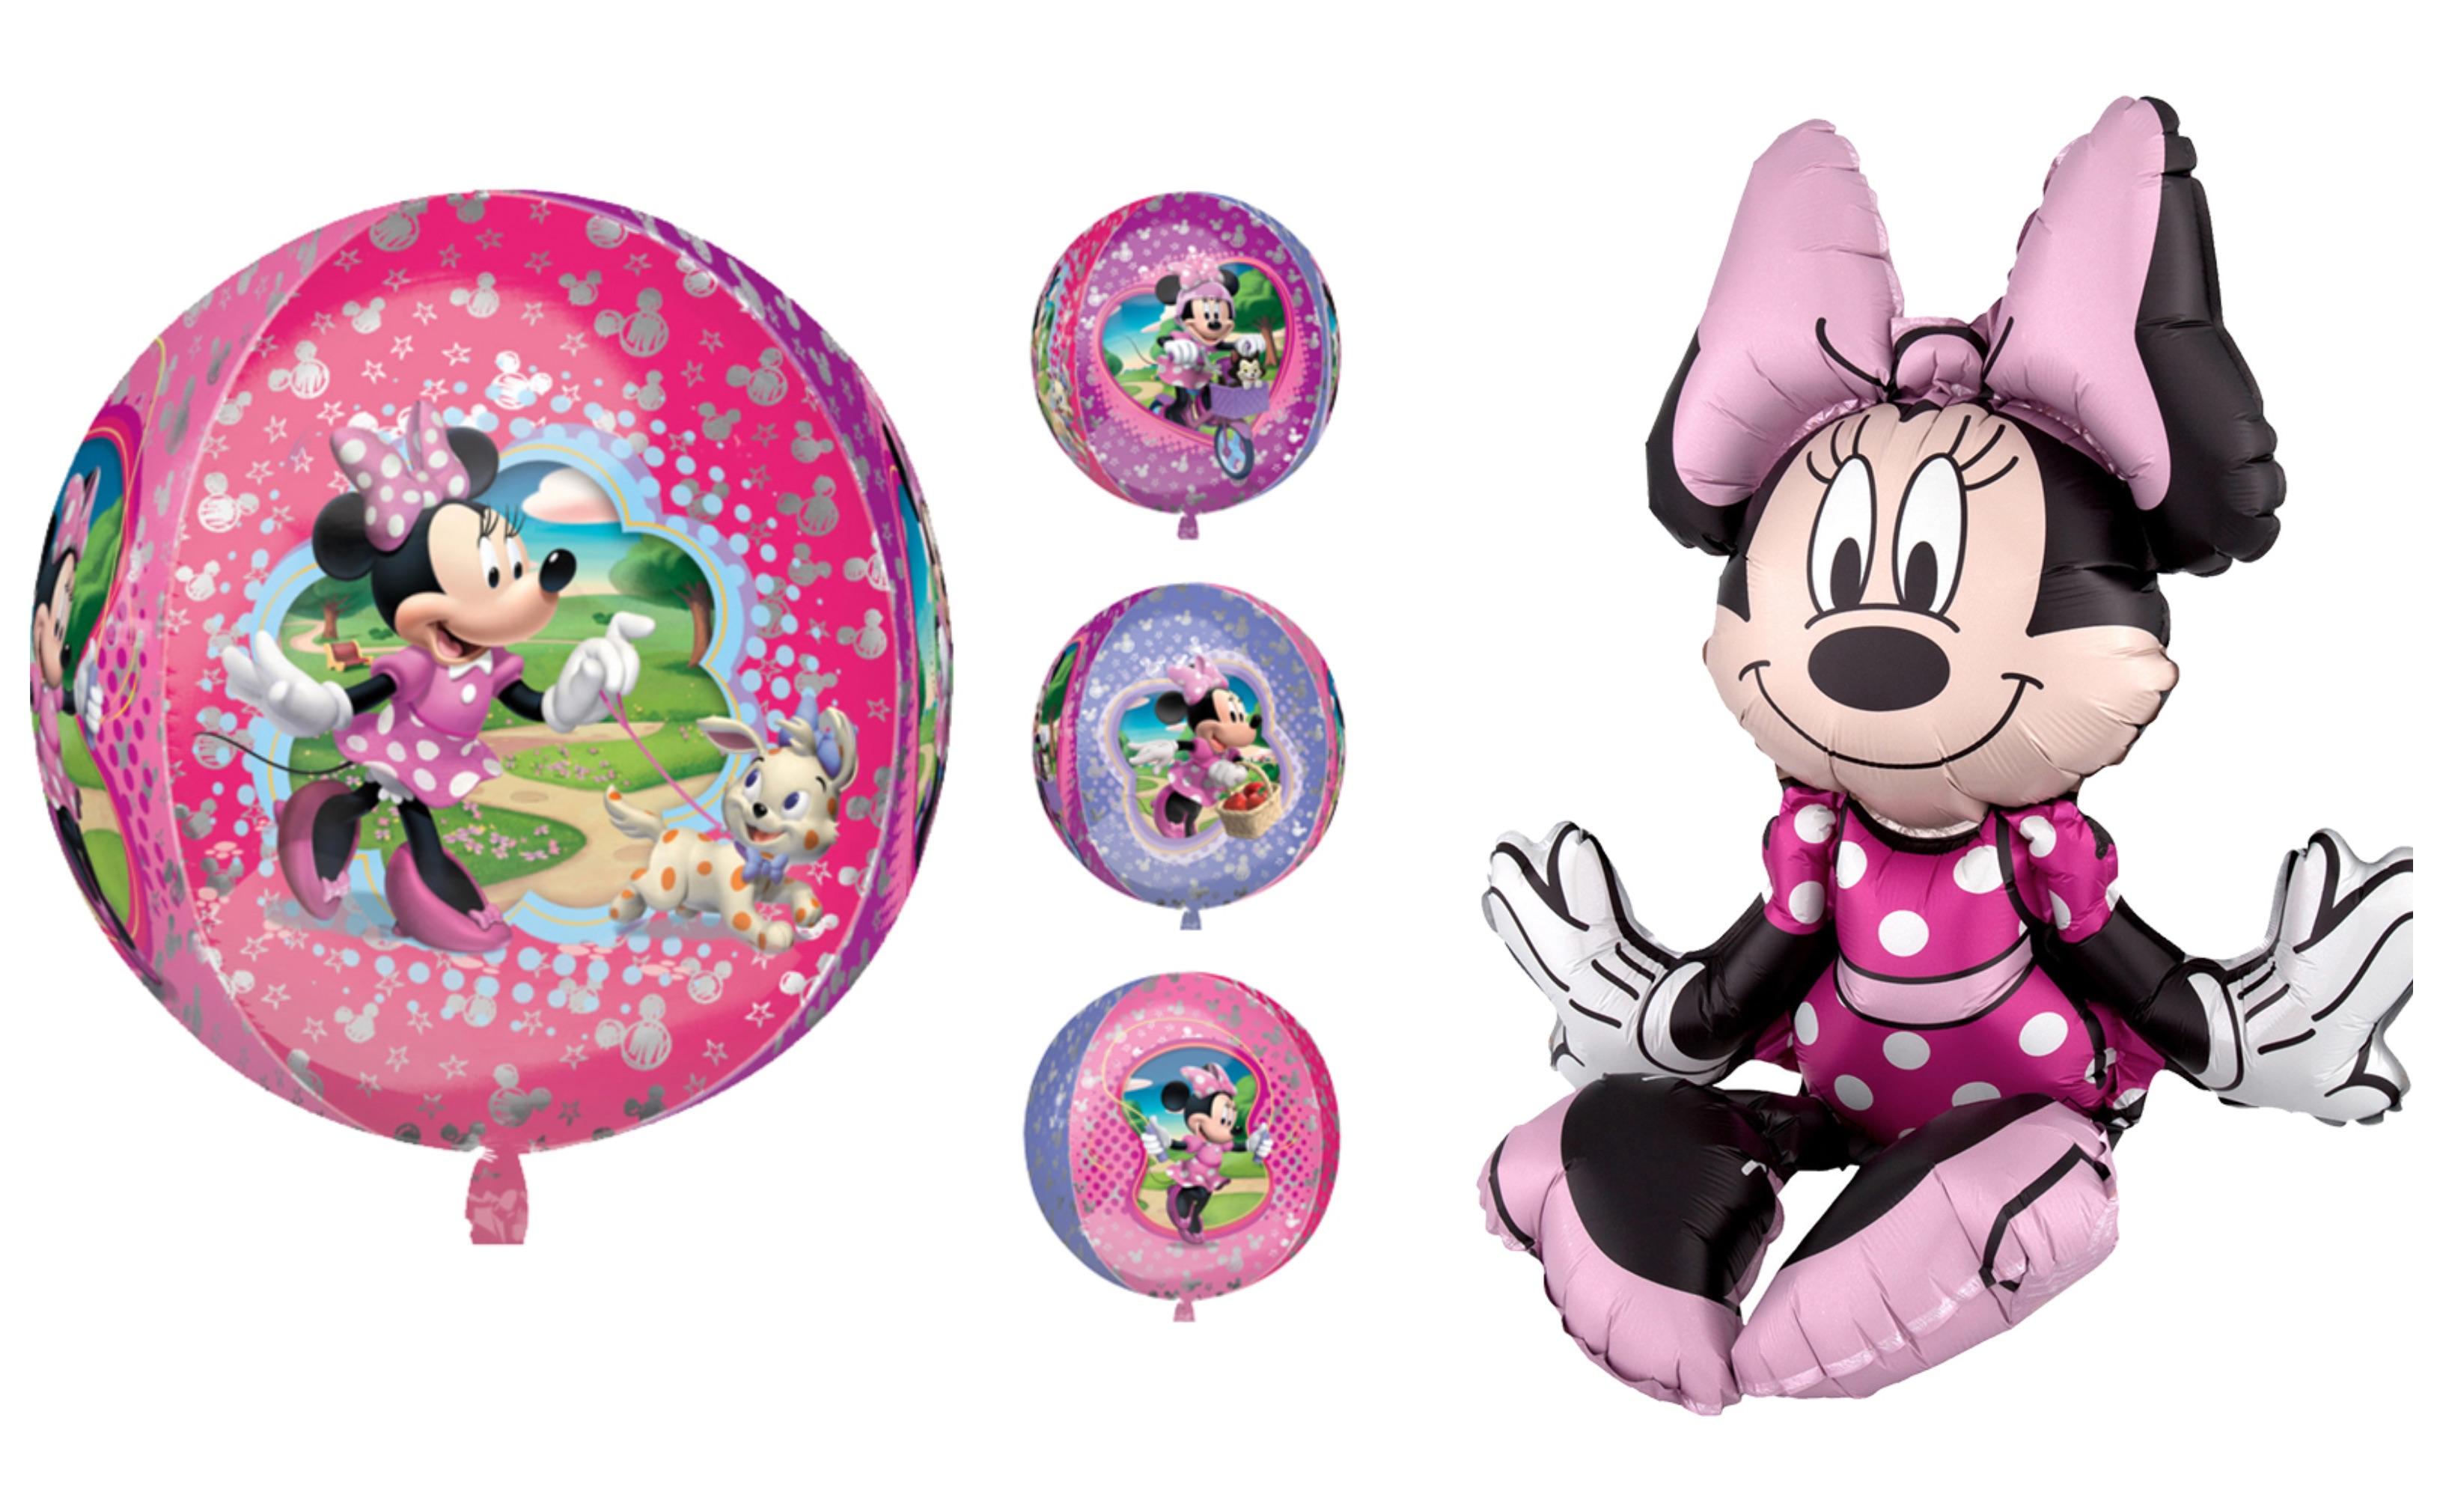 Minnie Mouse folieballon – til Minnie Mouse fødselsdagsfesten